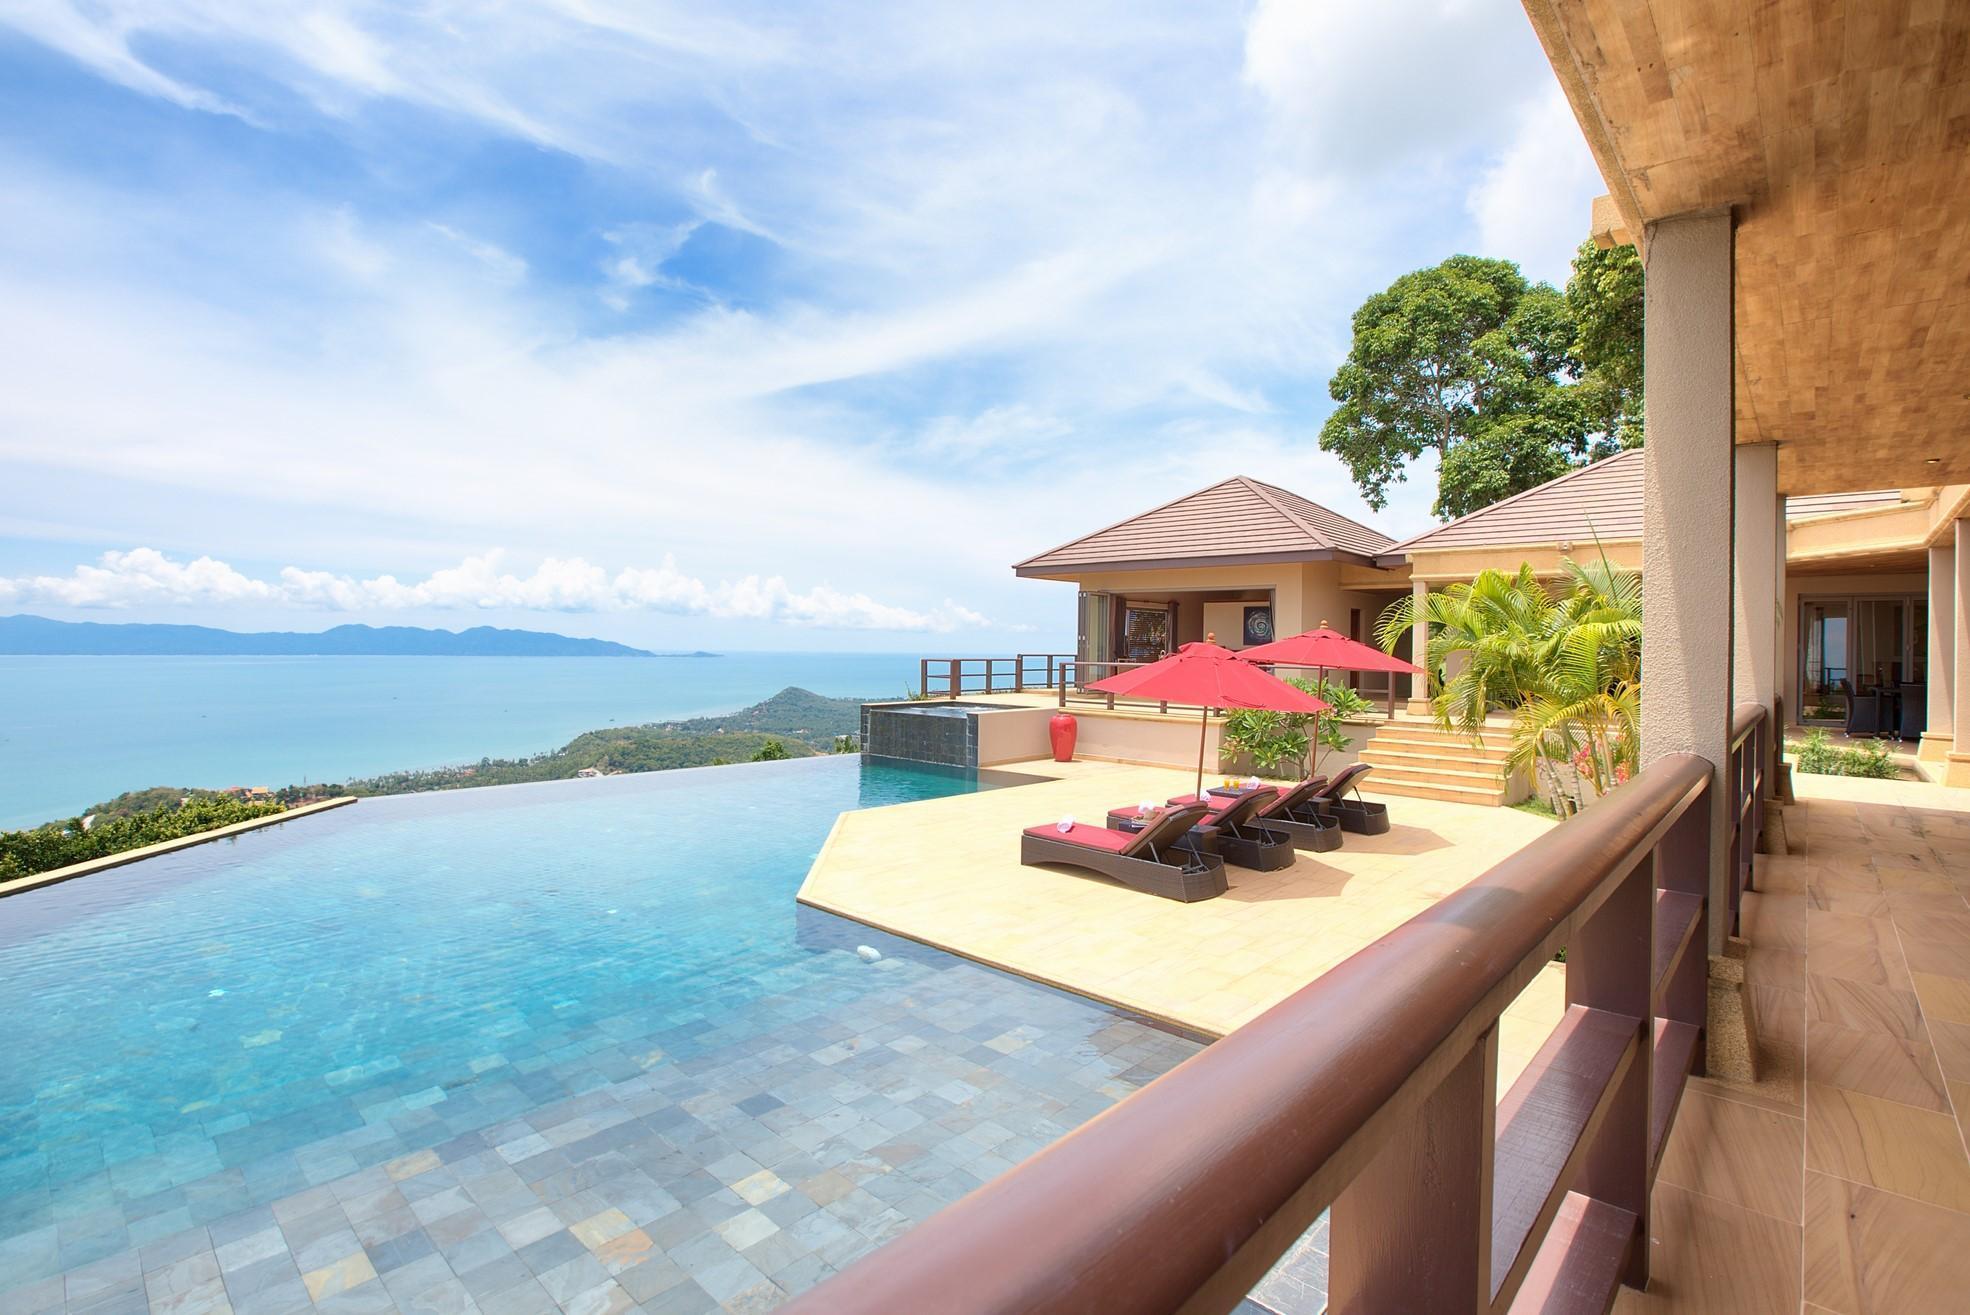 Villa Baan Faa Sai  5***** for 8 guests Villa Baan Faa Sai  5***** for 8 guests